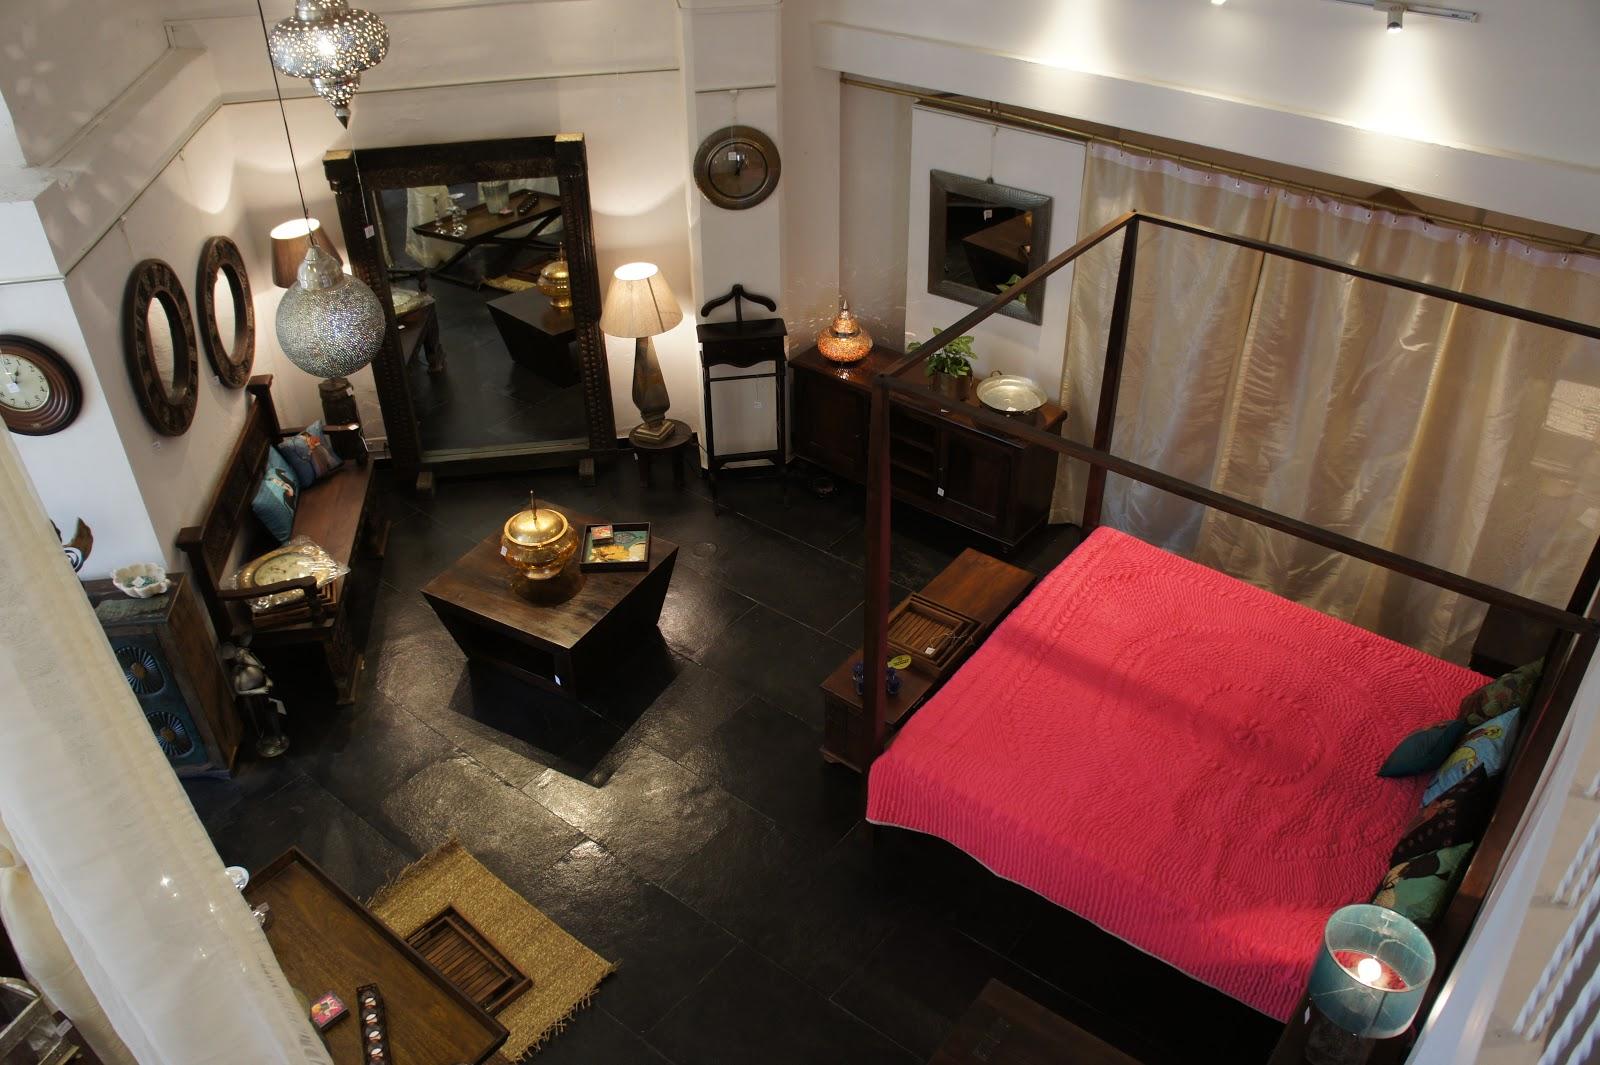 Furniture 123 - Beds - Sofas - Bedroom Dining Room